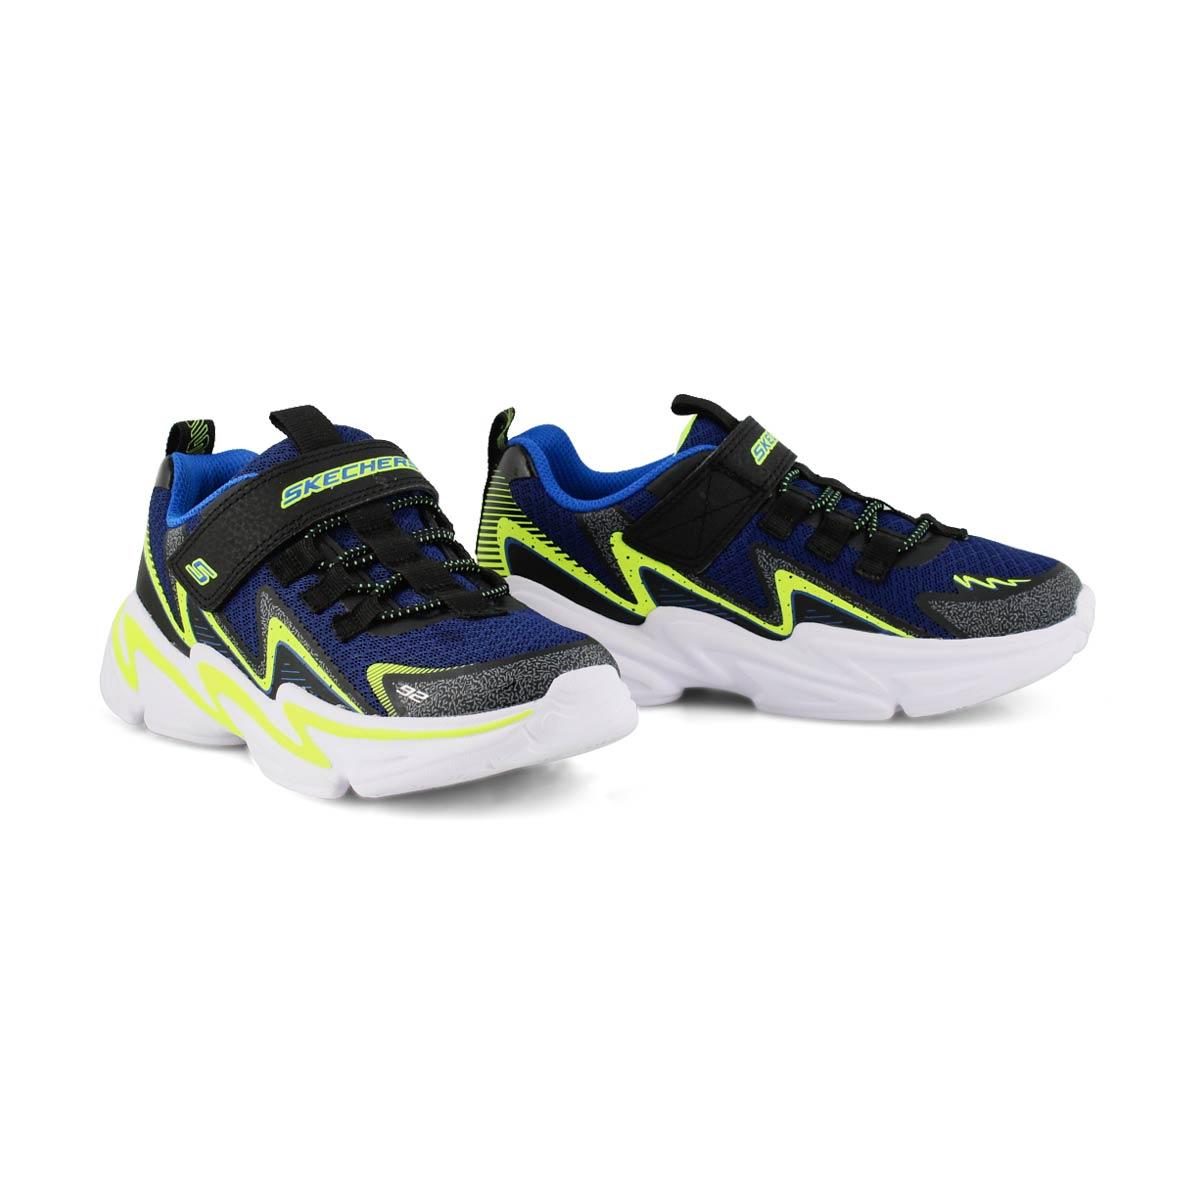 Bys Wavetronic Sneaker -Black/Navy